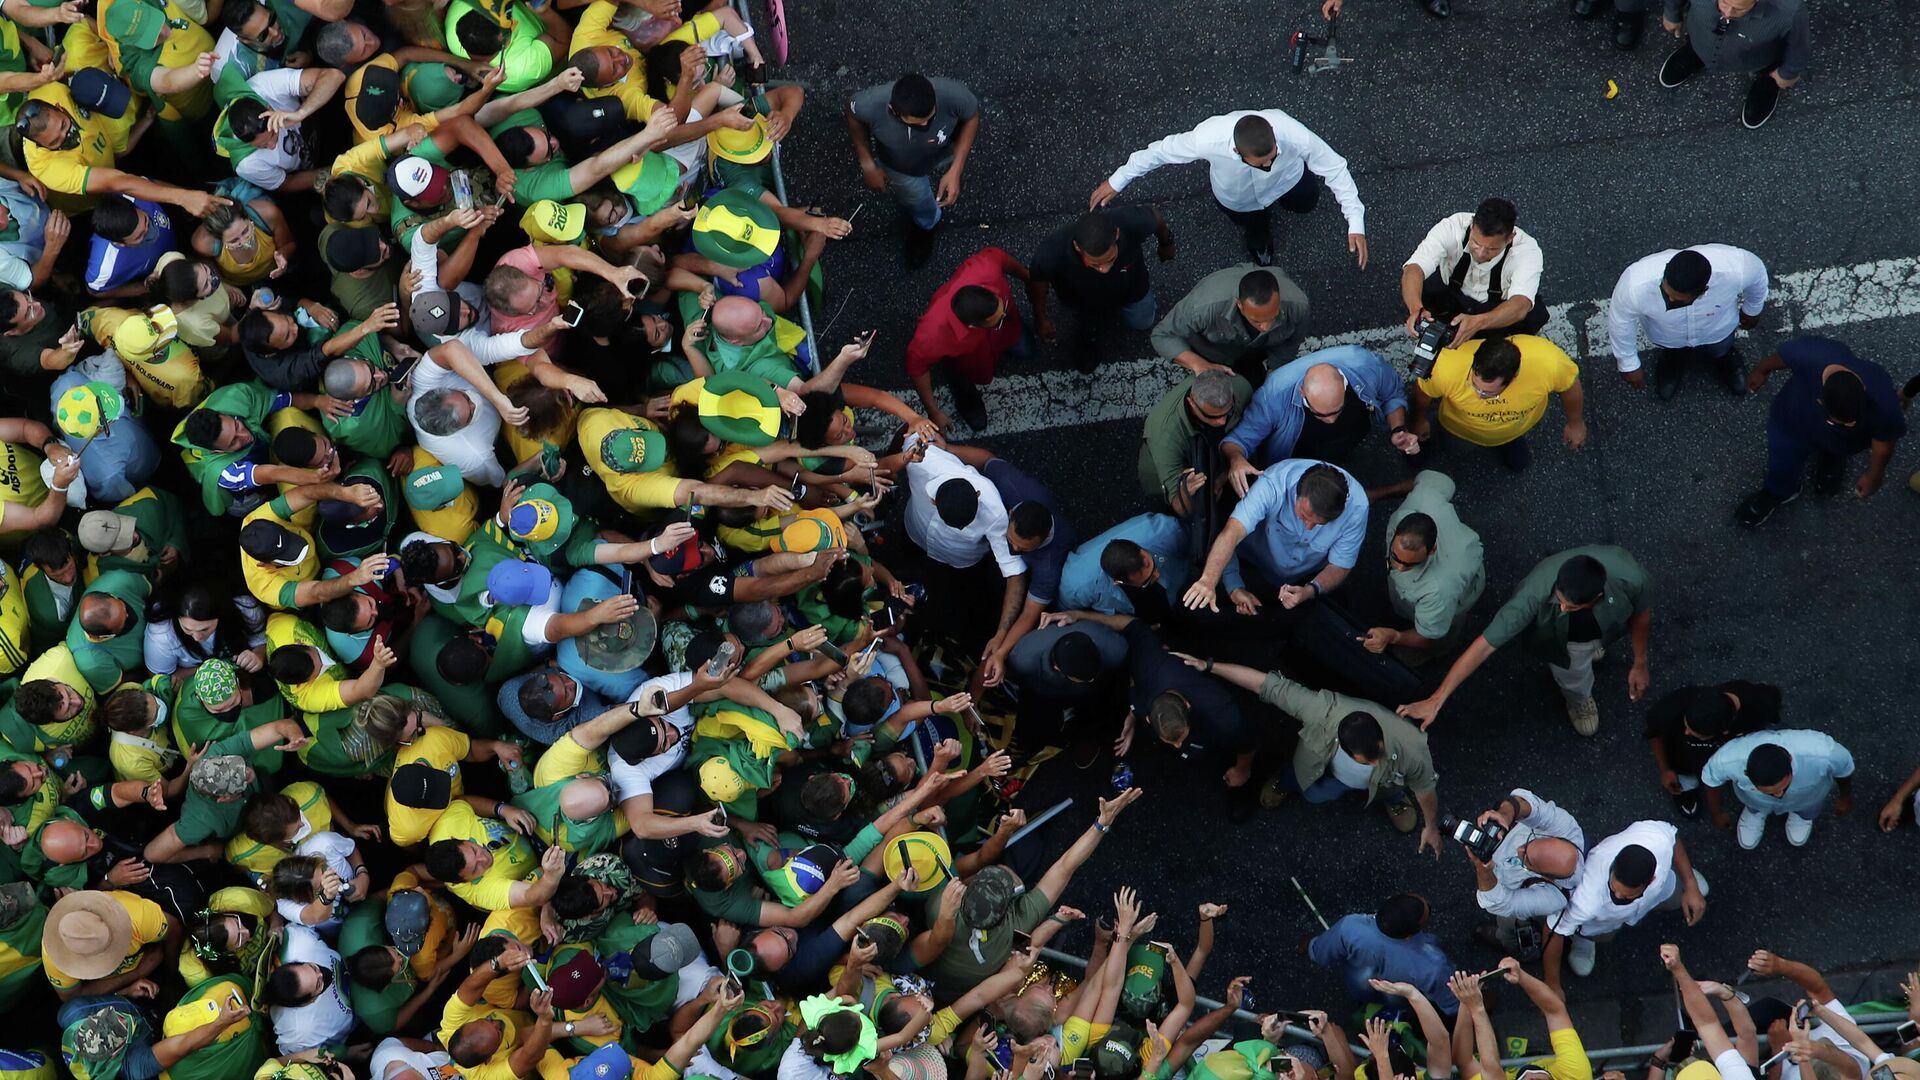 Jair Bolsonaro, presidente de Brasil - Sputnik Mundo, 1920, 07.09.2021